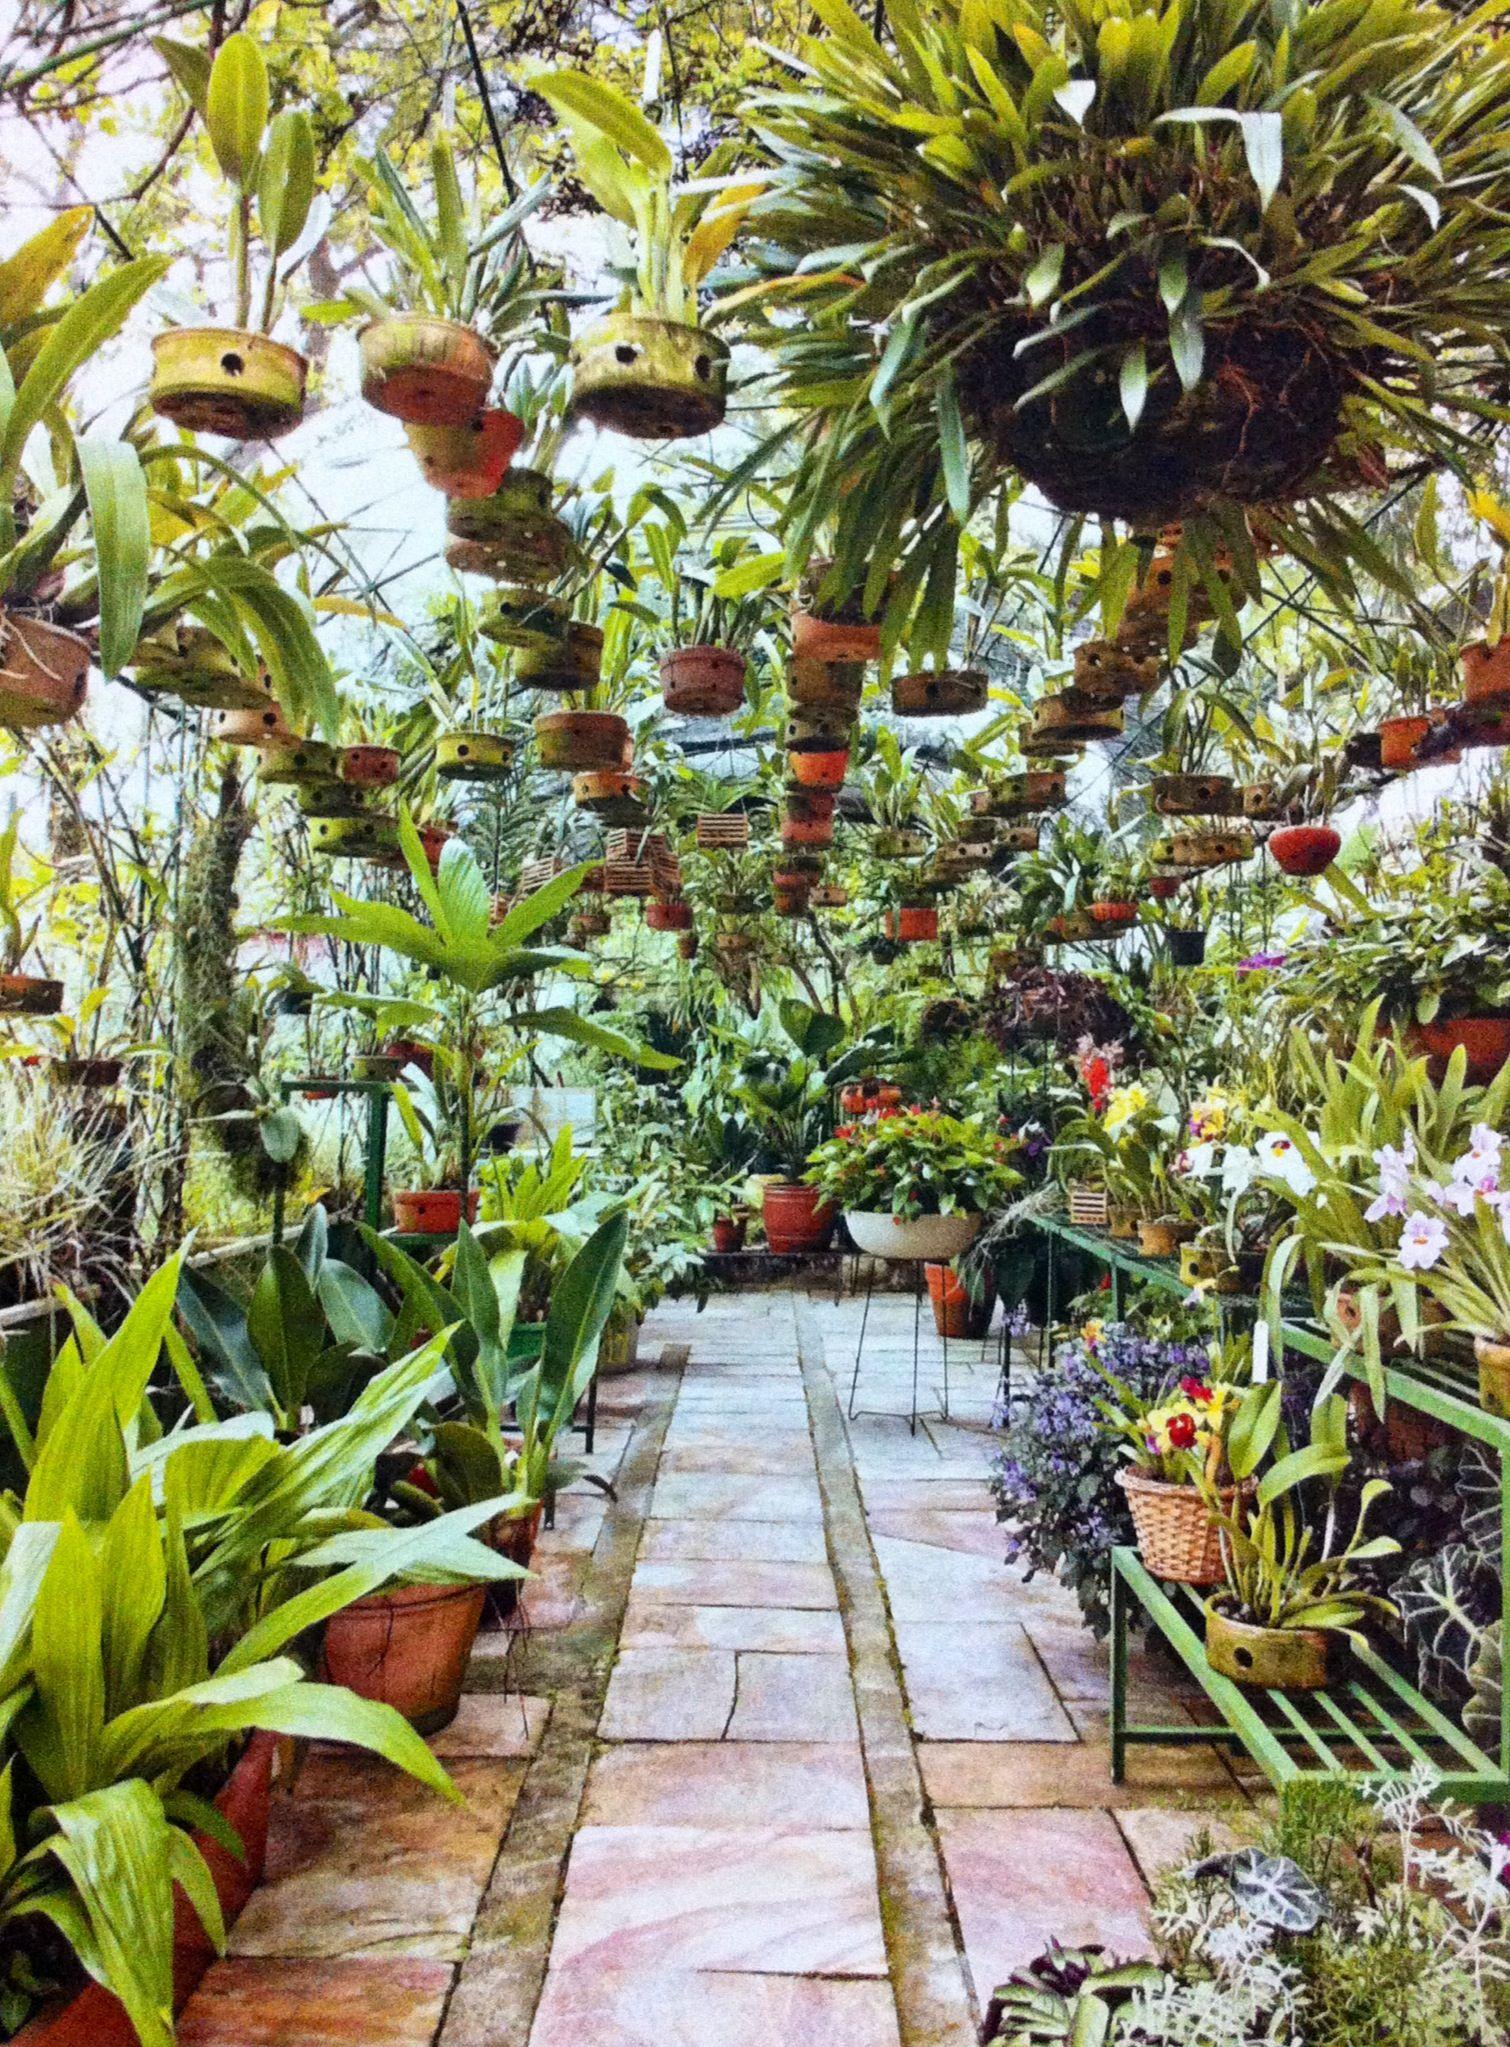 ideias originais jardim : ideias originais jardim:Estufa